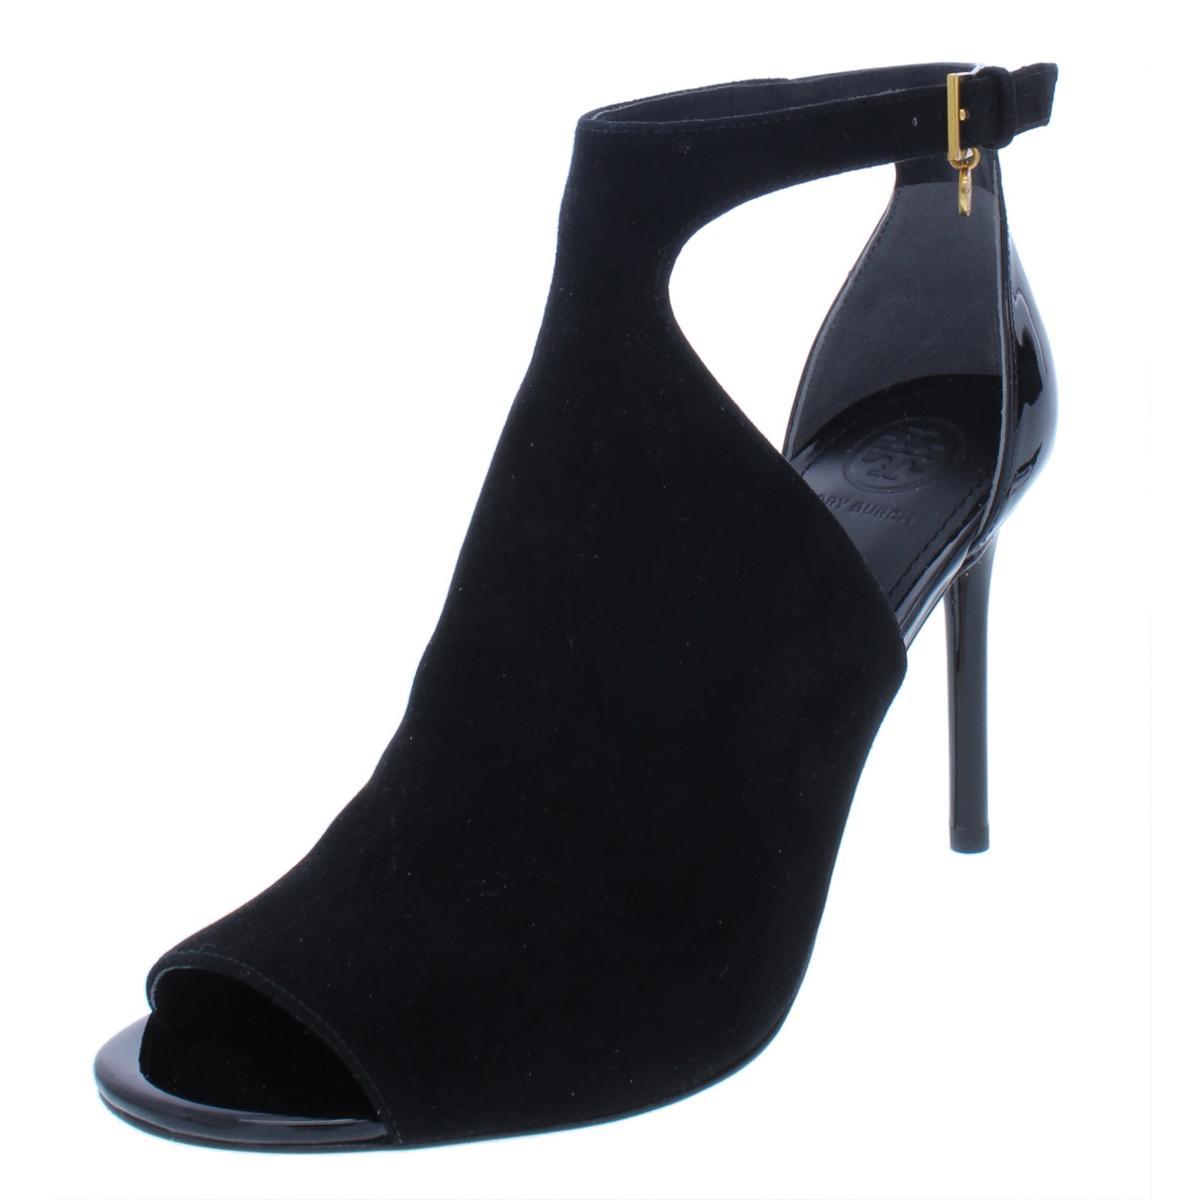 8c7b95d873a Details about Tory Burch Womens Ashton Black Suede Booties Shoes 8.5 Medium  (B